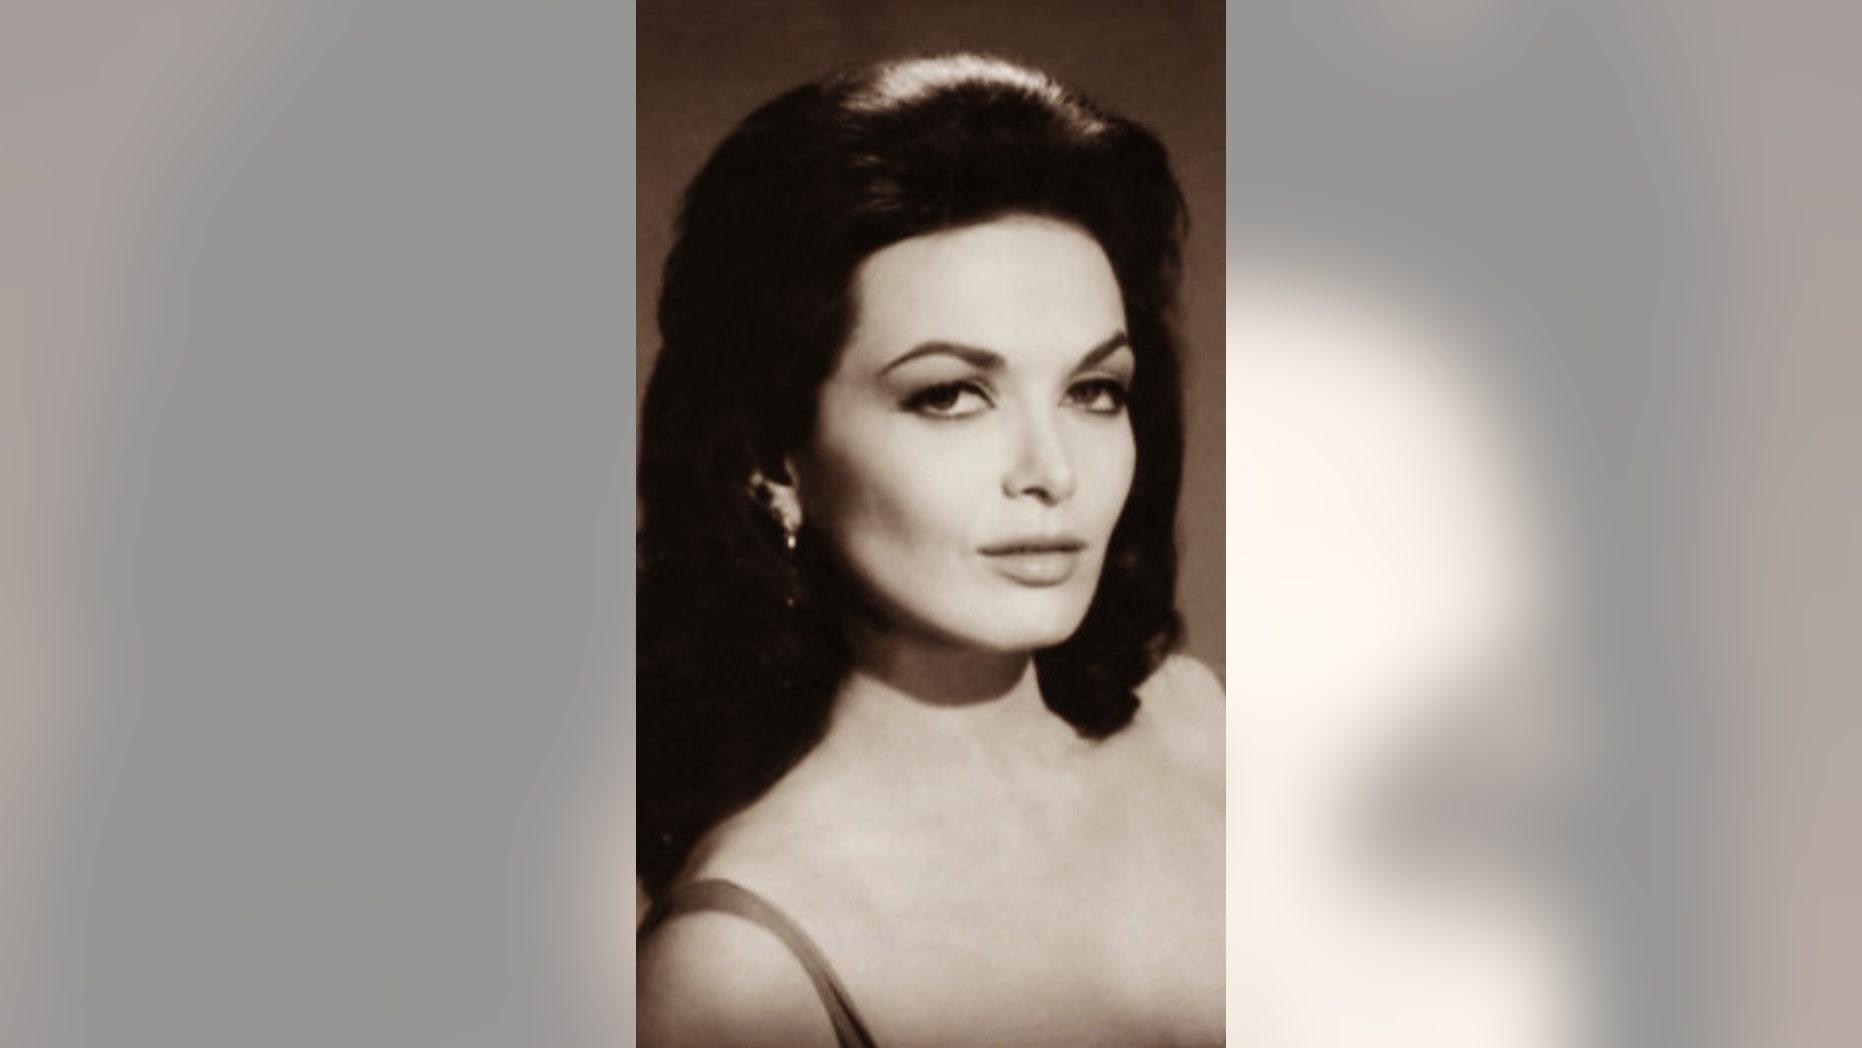 Actress Lisa Seagram passed away at age 82.